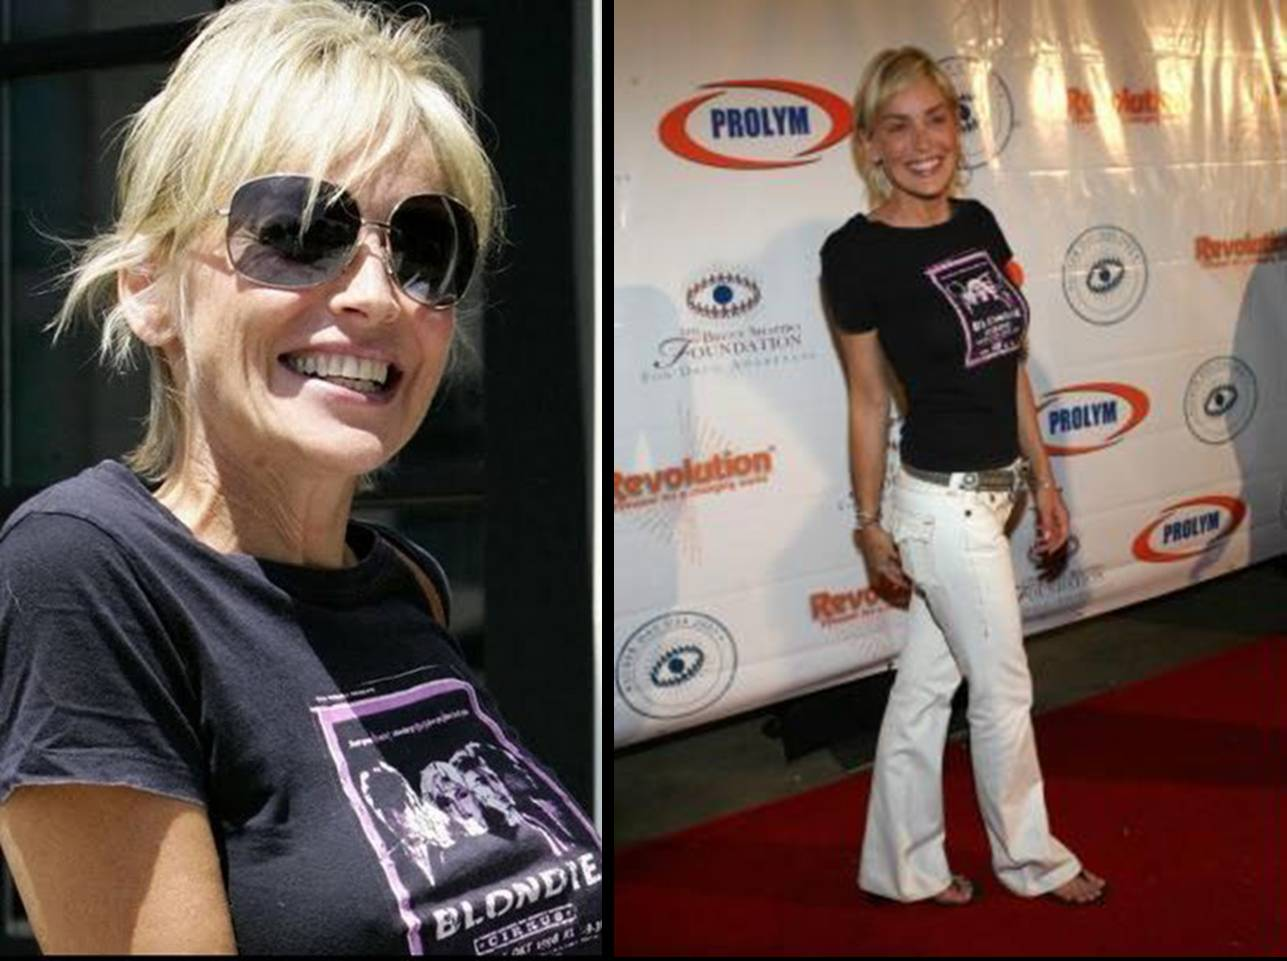 http://1.bp.blogspot.com/__RGPBBnf8b8/TGrptg0egrI/AAAAAAAADWo/8ksi-uf-lDQ/s1600/sharon+stone++-++Blondie.jpg